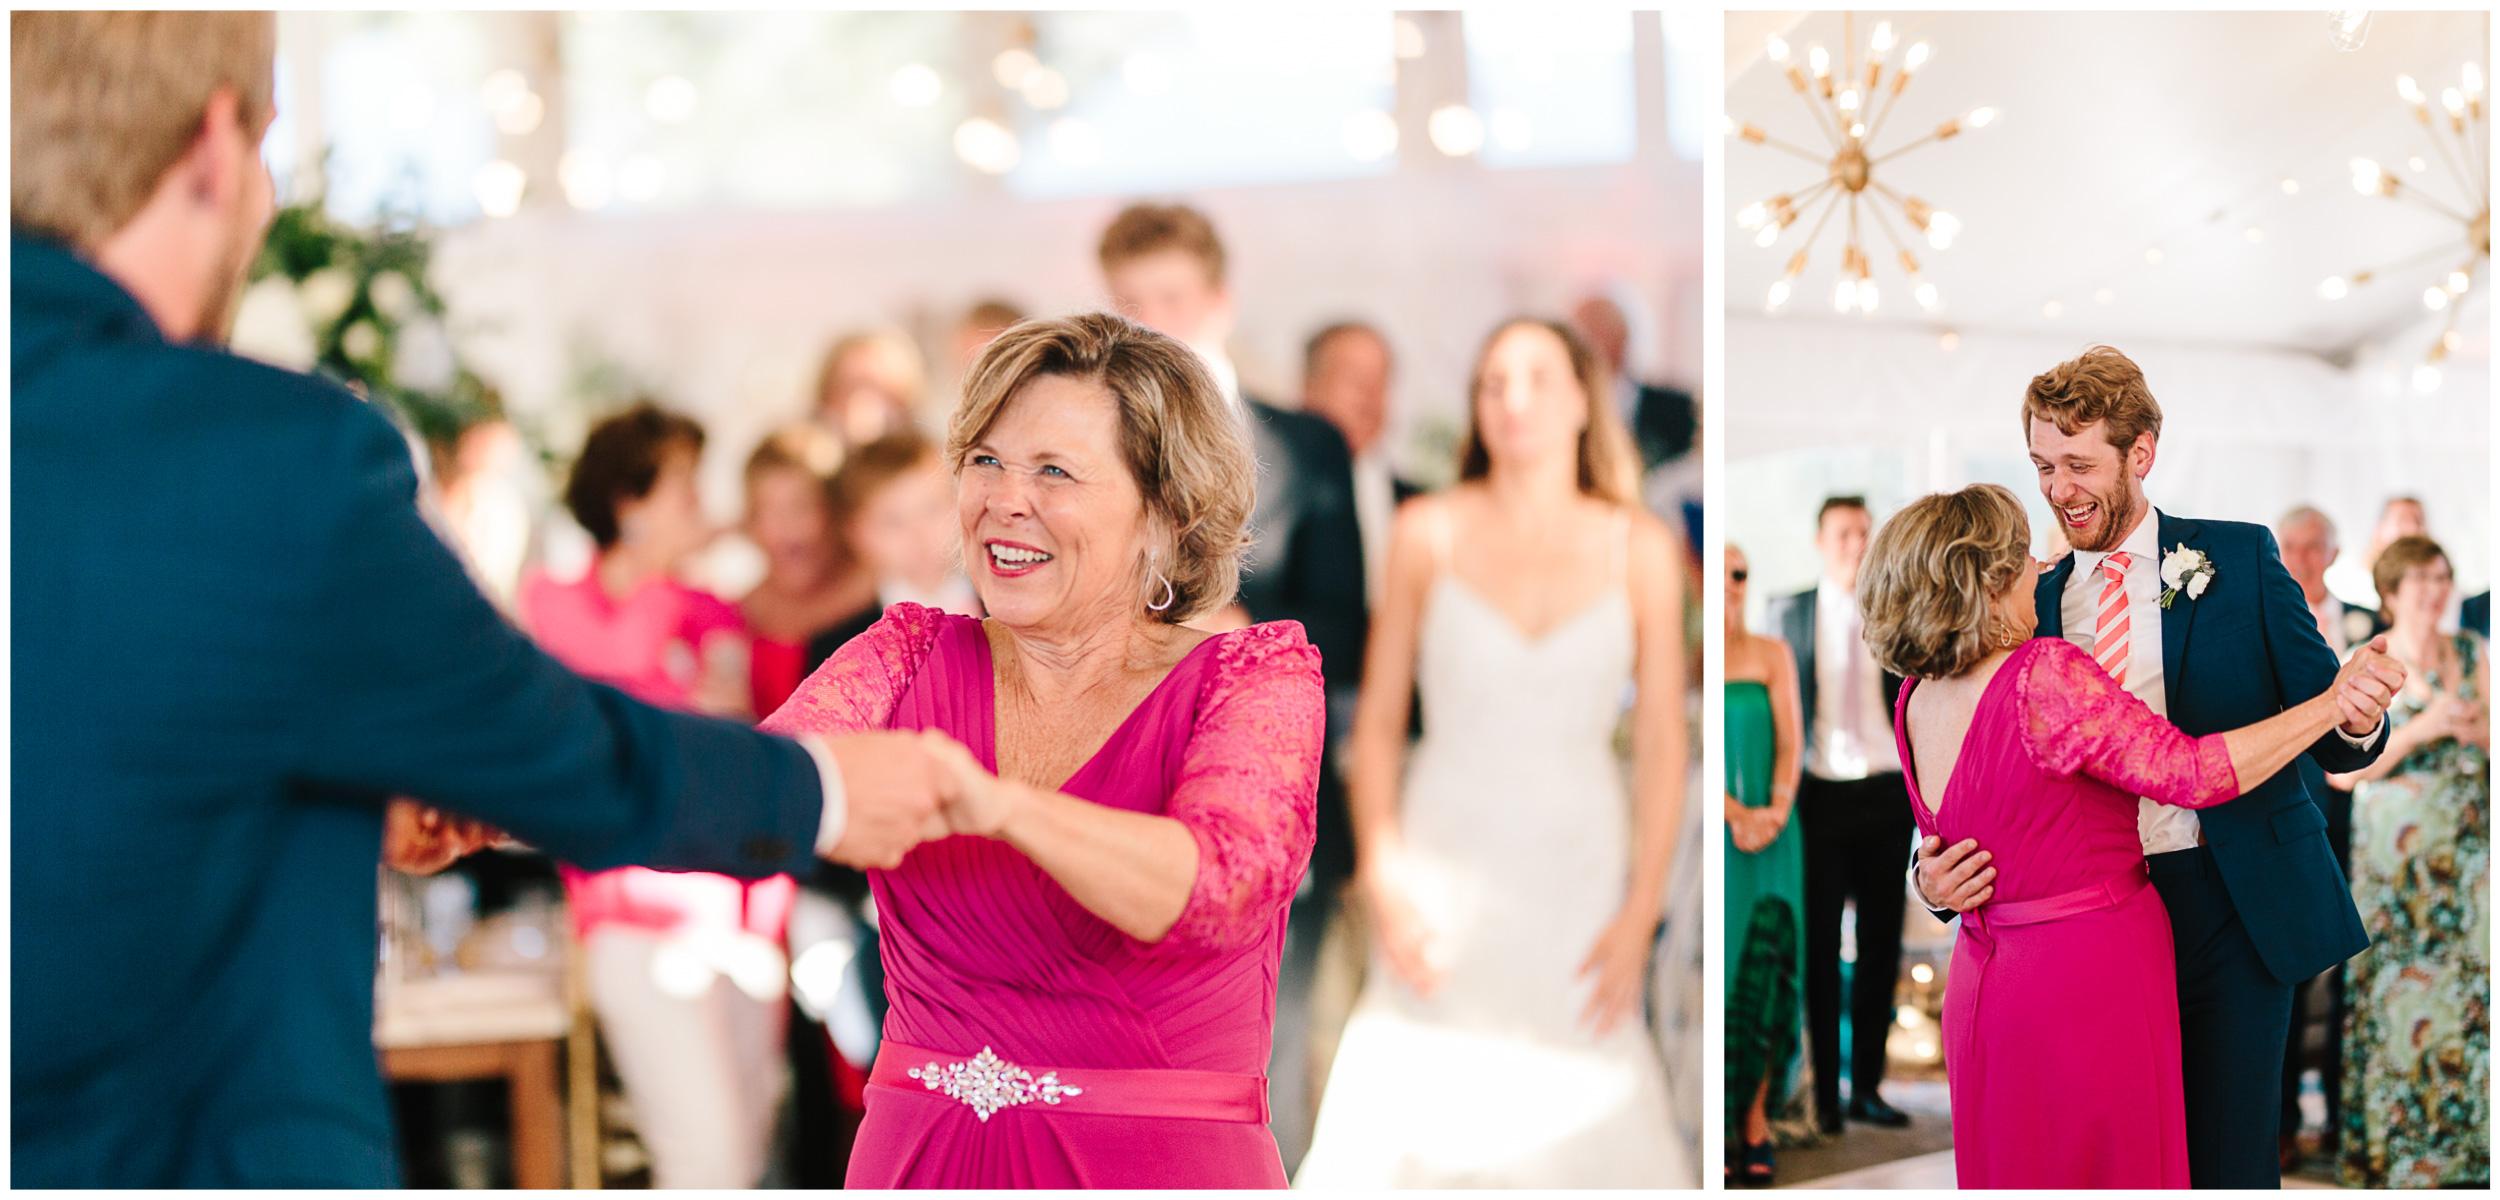 crested_butte_wedding_112.jpg